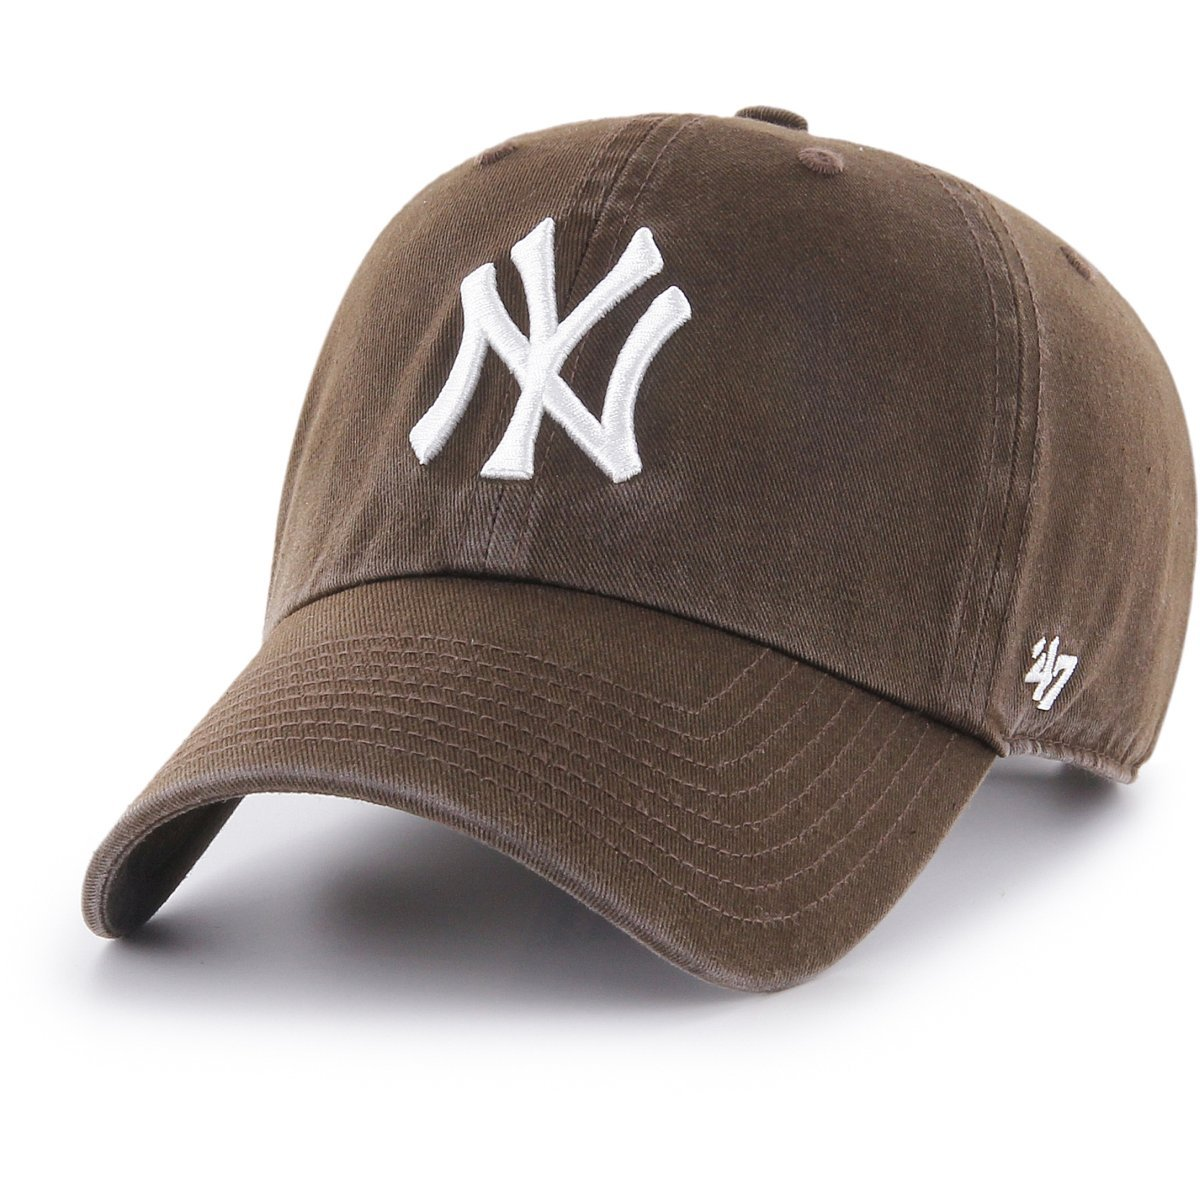 b1c4f6c85c2 Amazon.com    47 Brand Adjustable Cap - Clean UP New York Yankees Brown    Sports   Outdoors